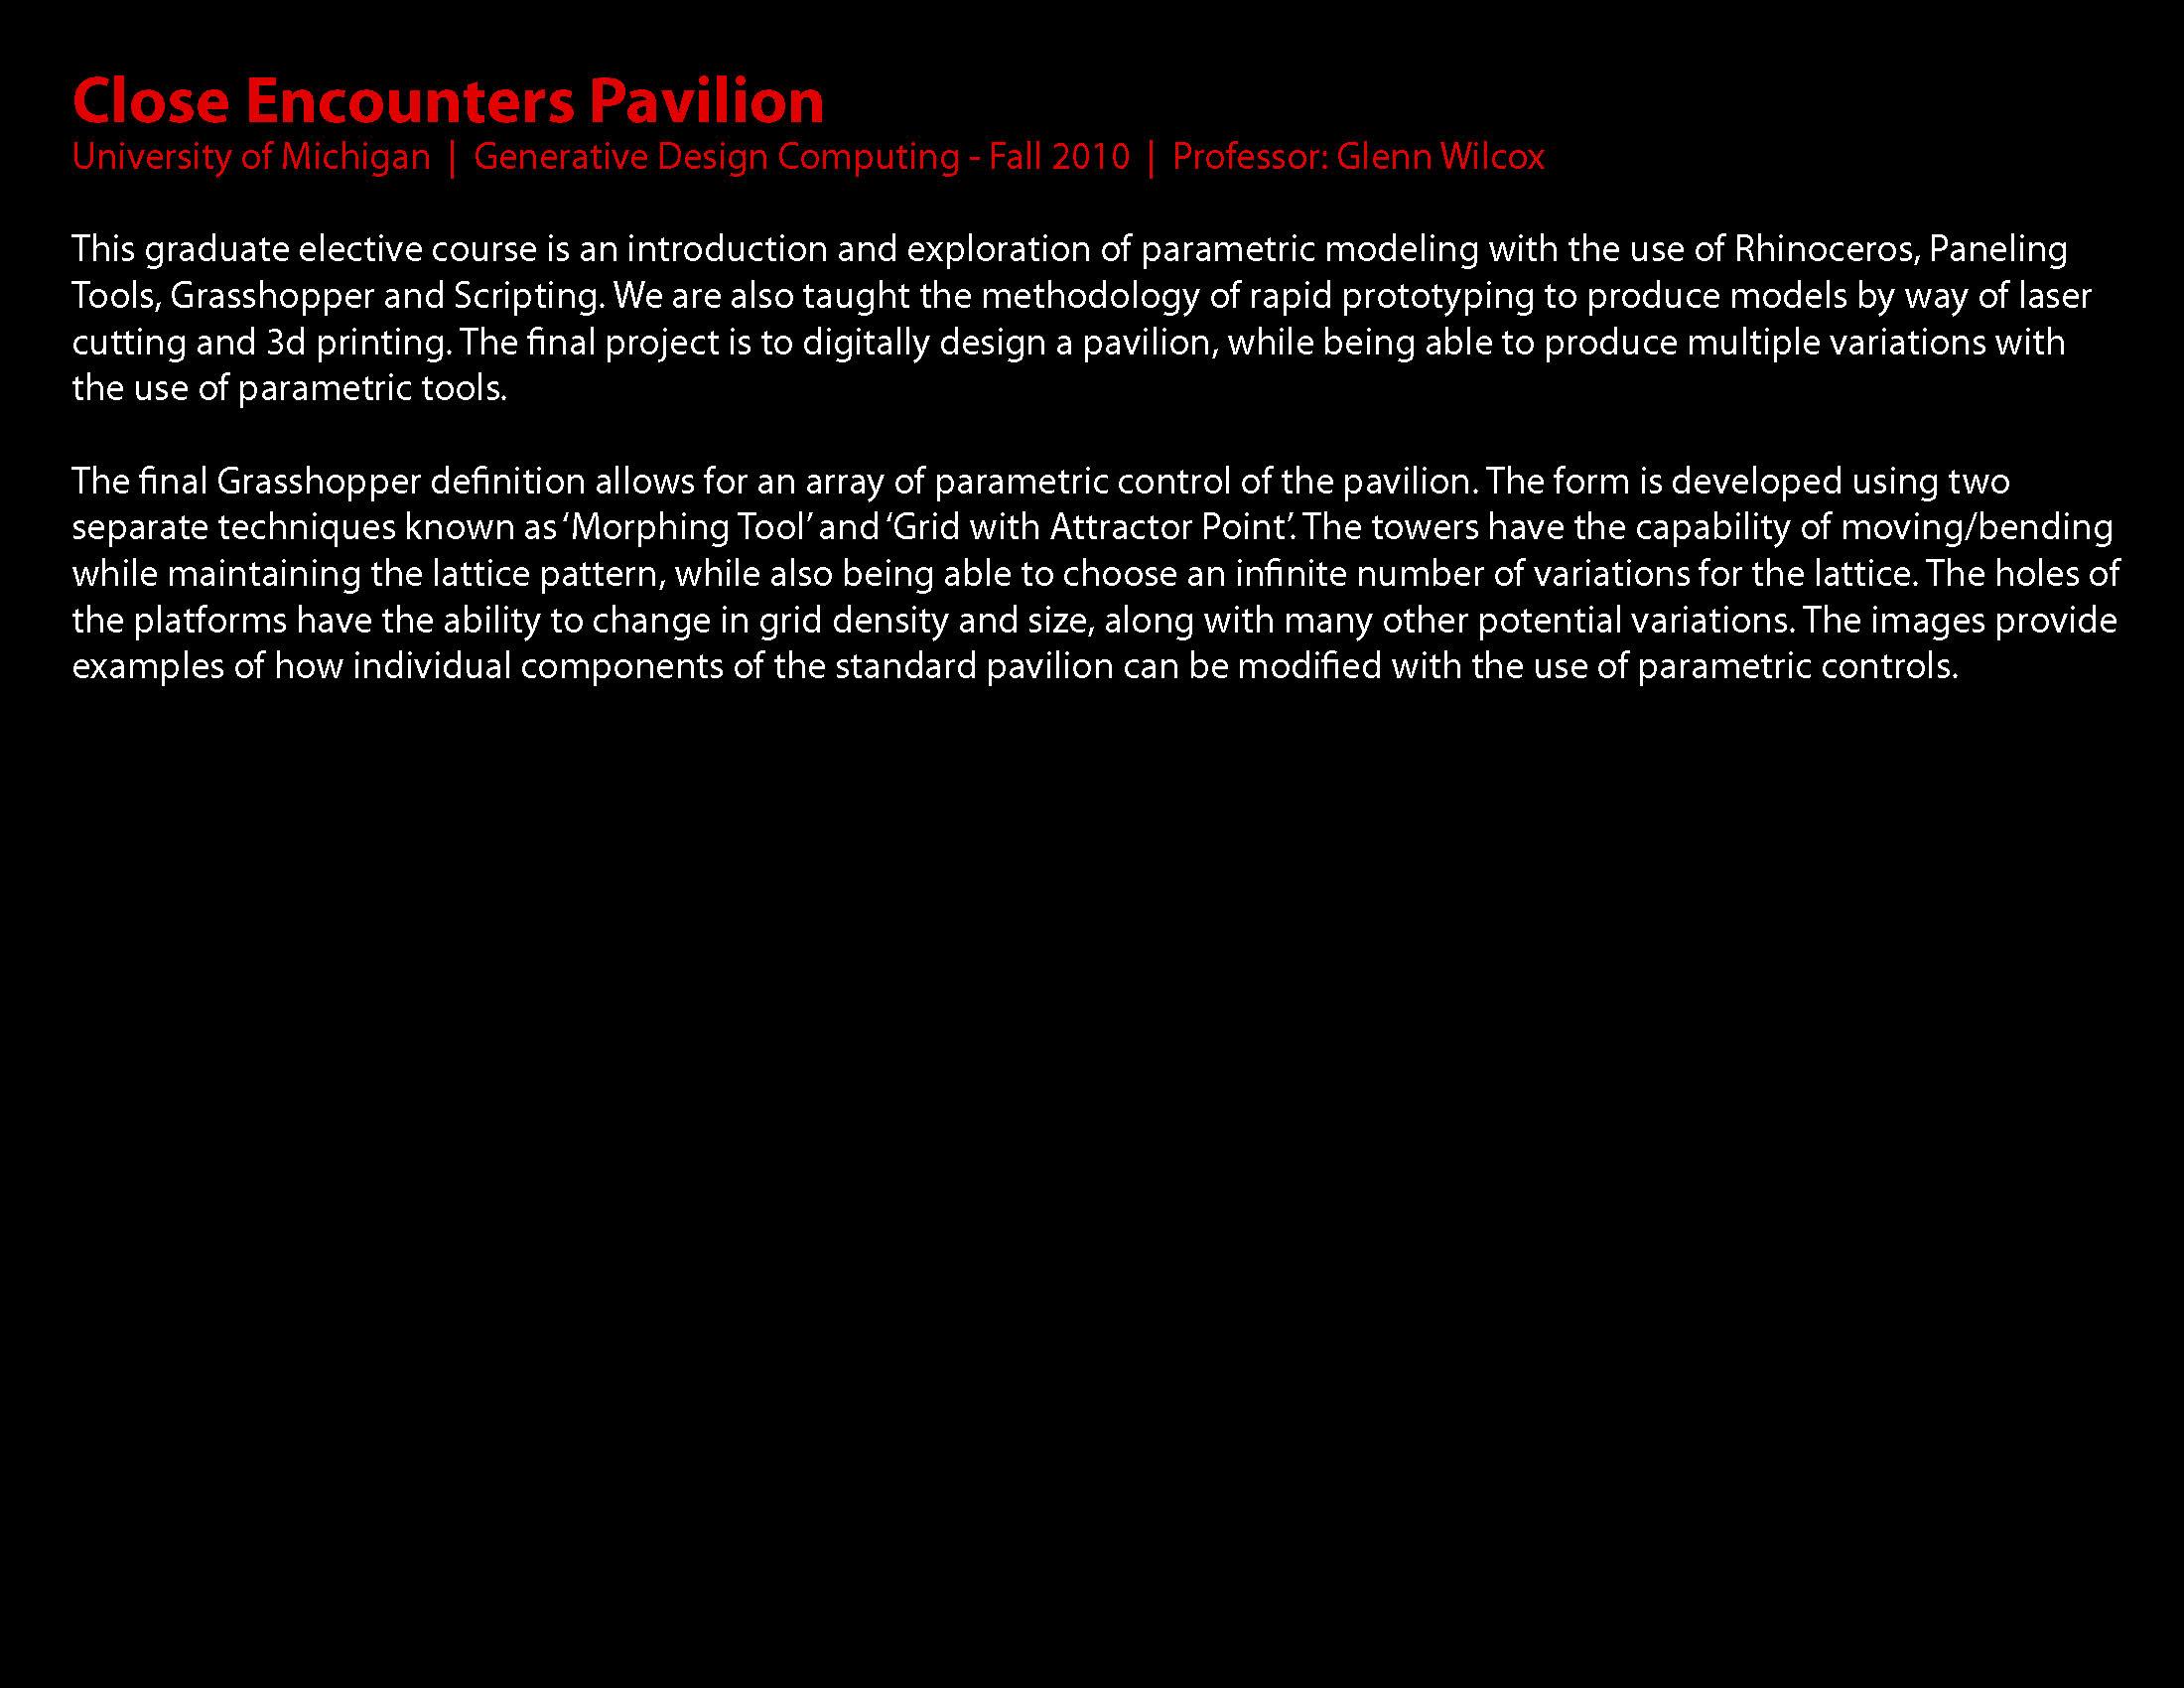 00.Project_Description-Close_Encounters-14_0310.jpg